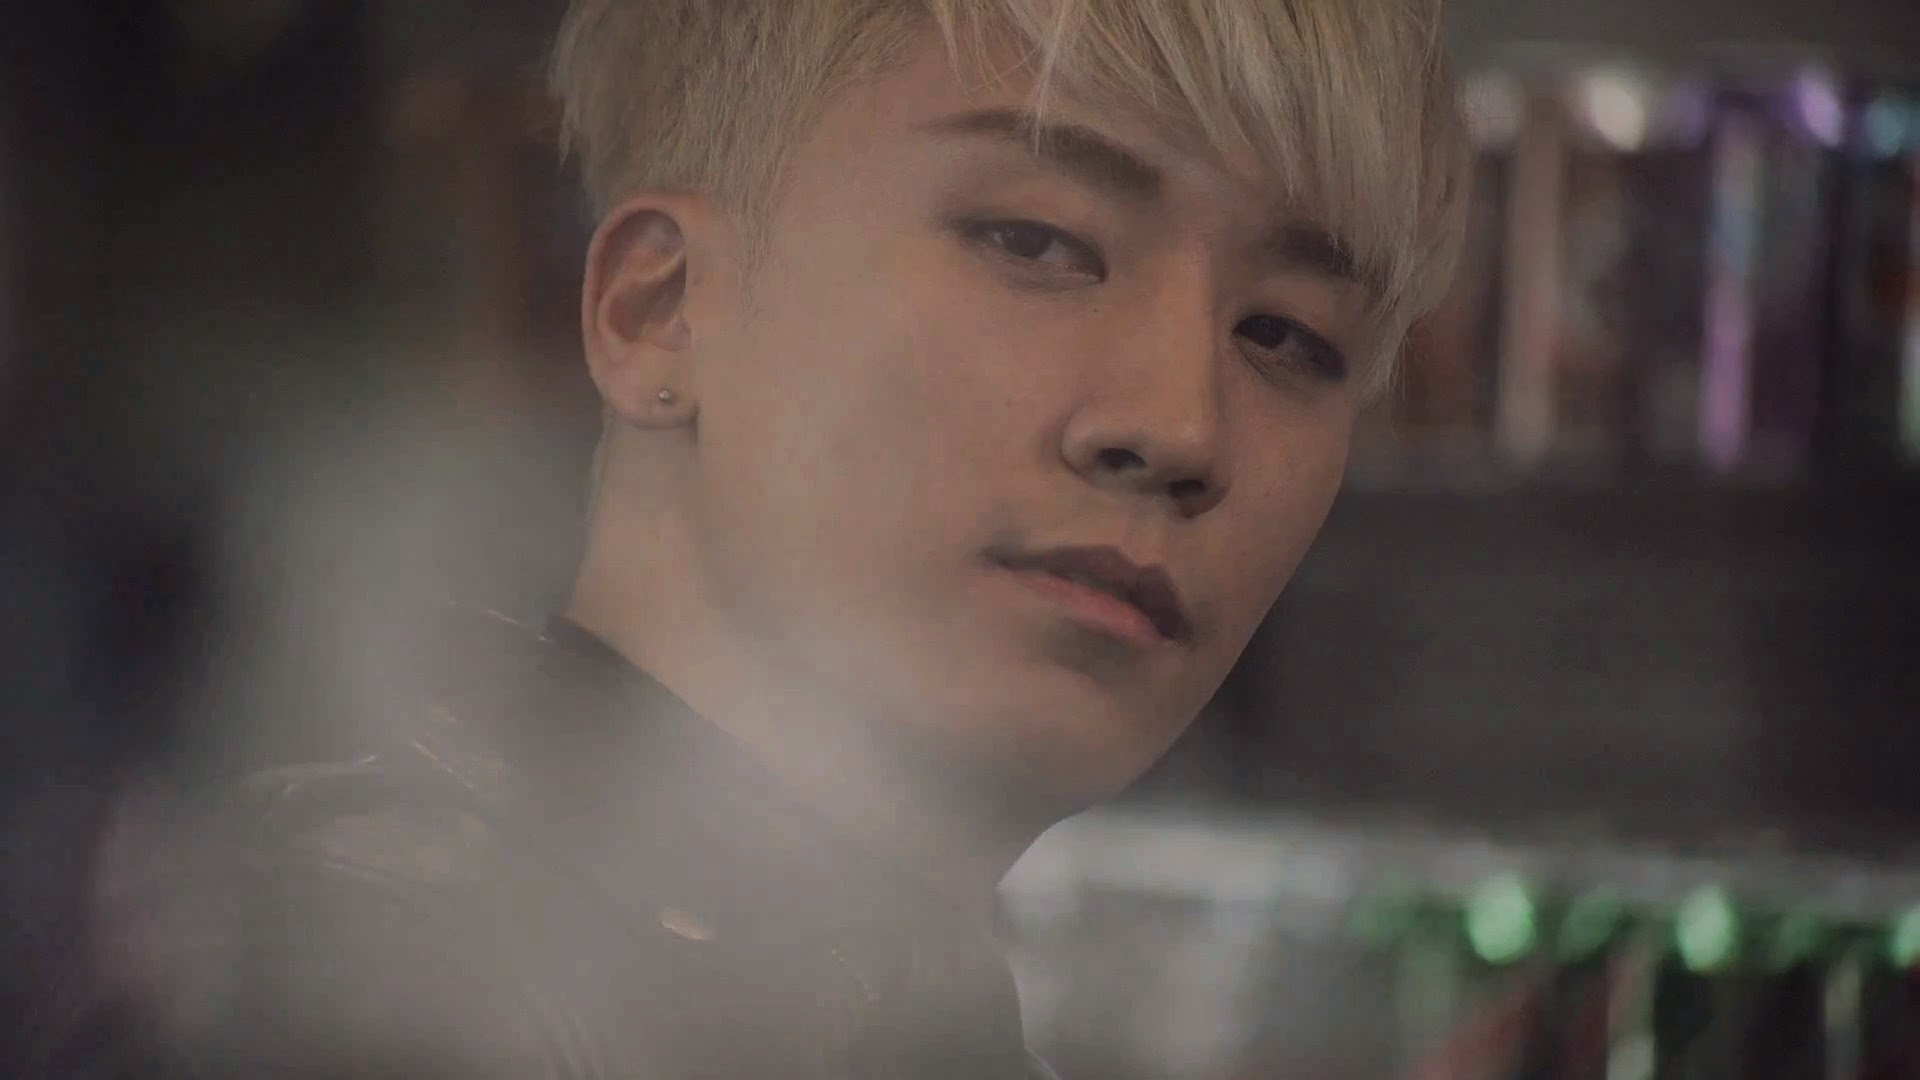 Bigbang's Seungri in Loser MV